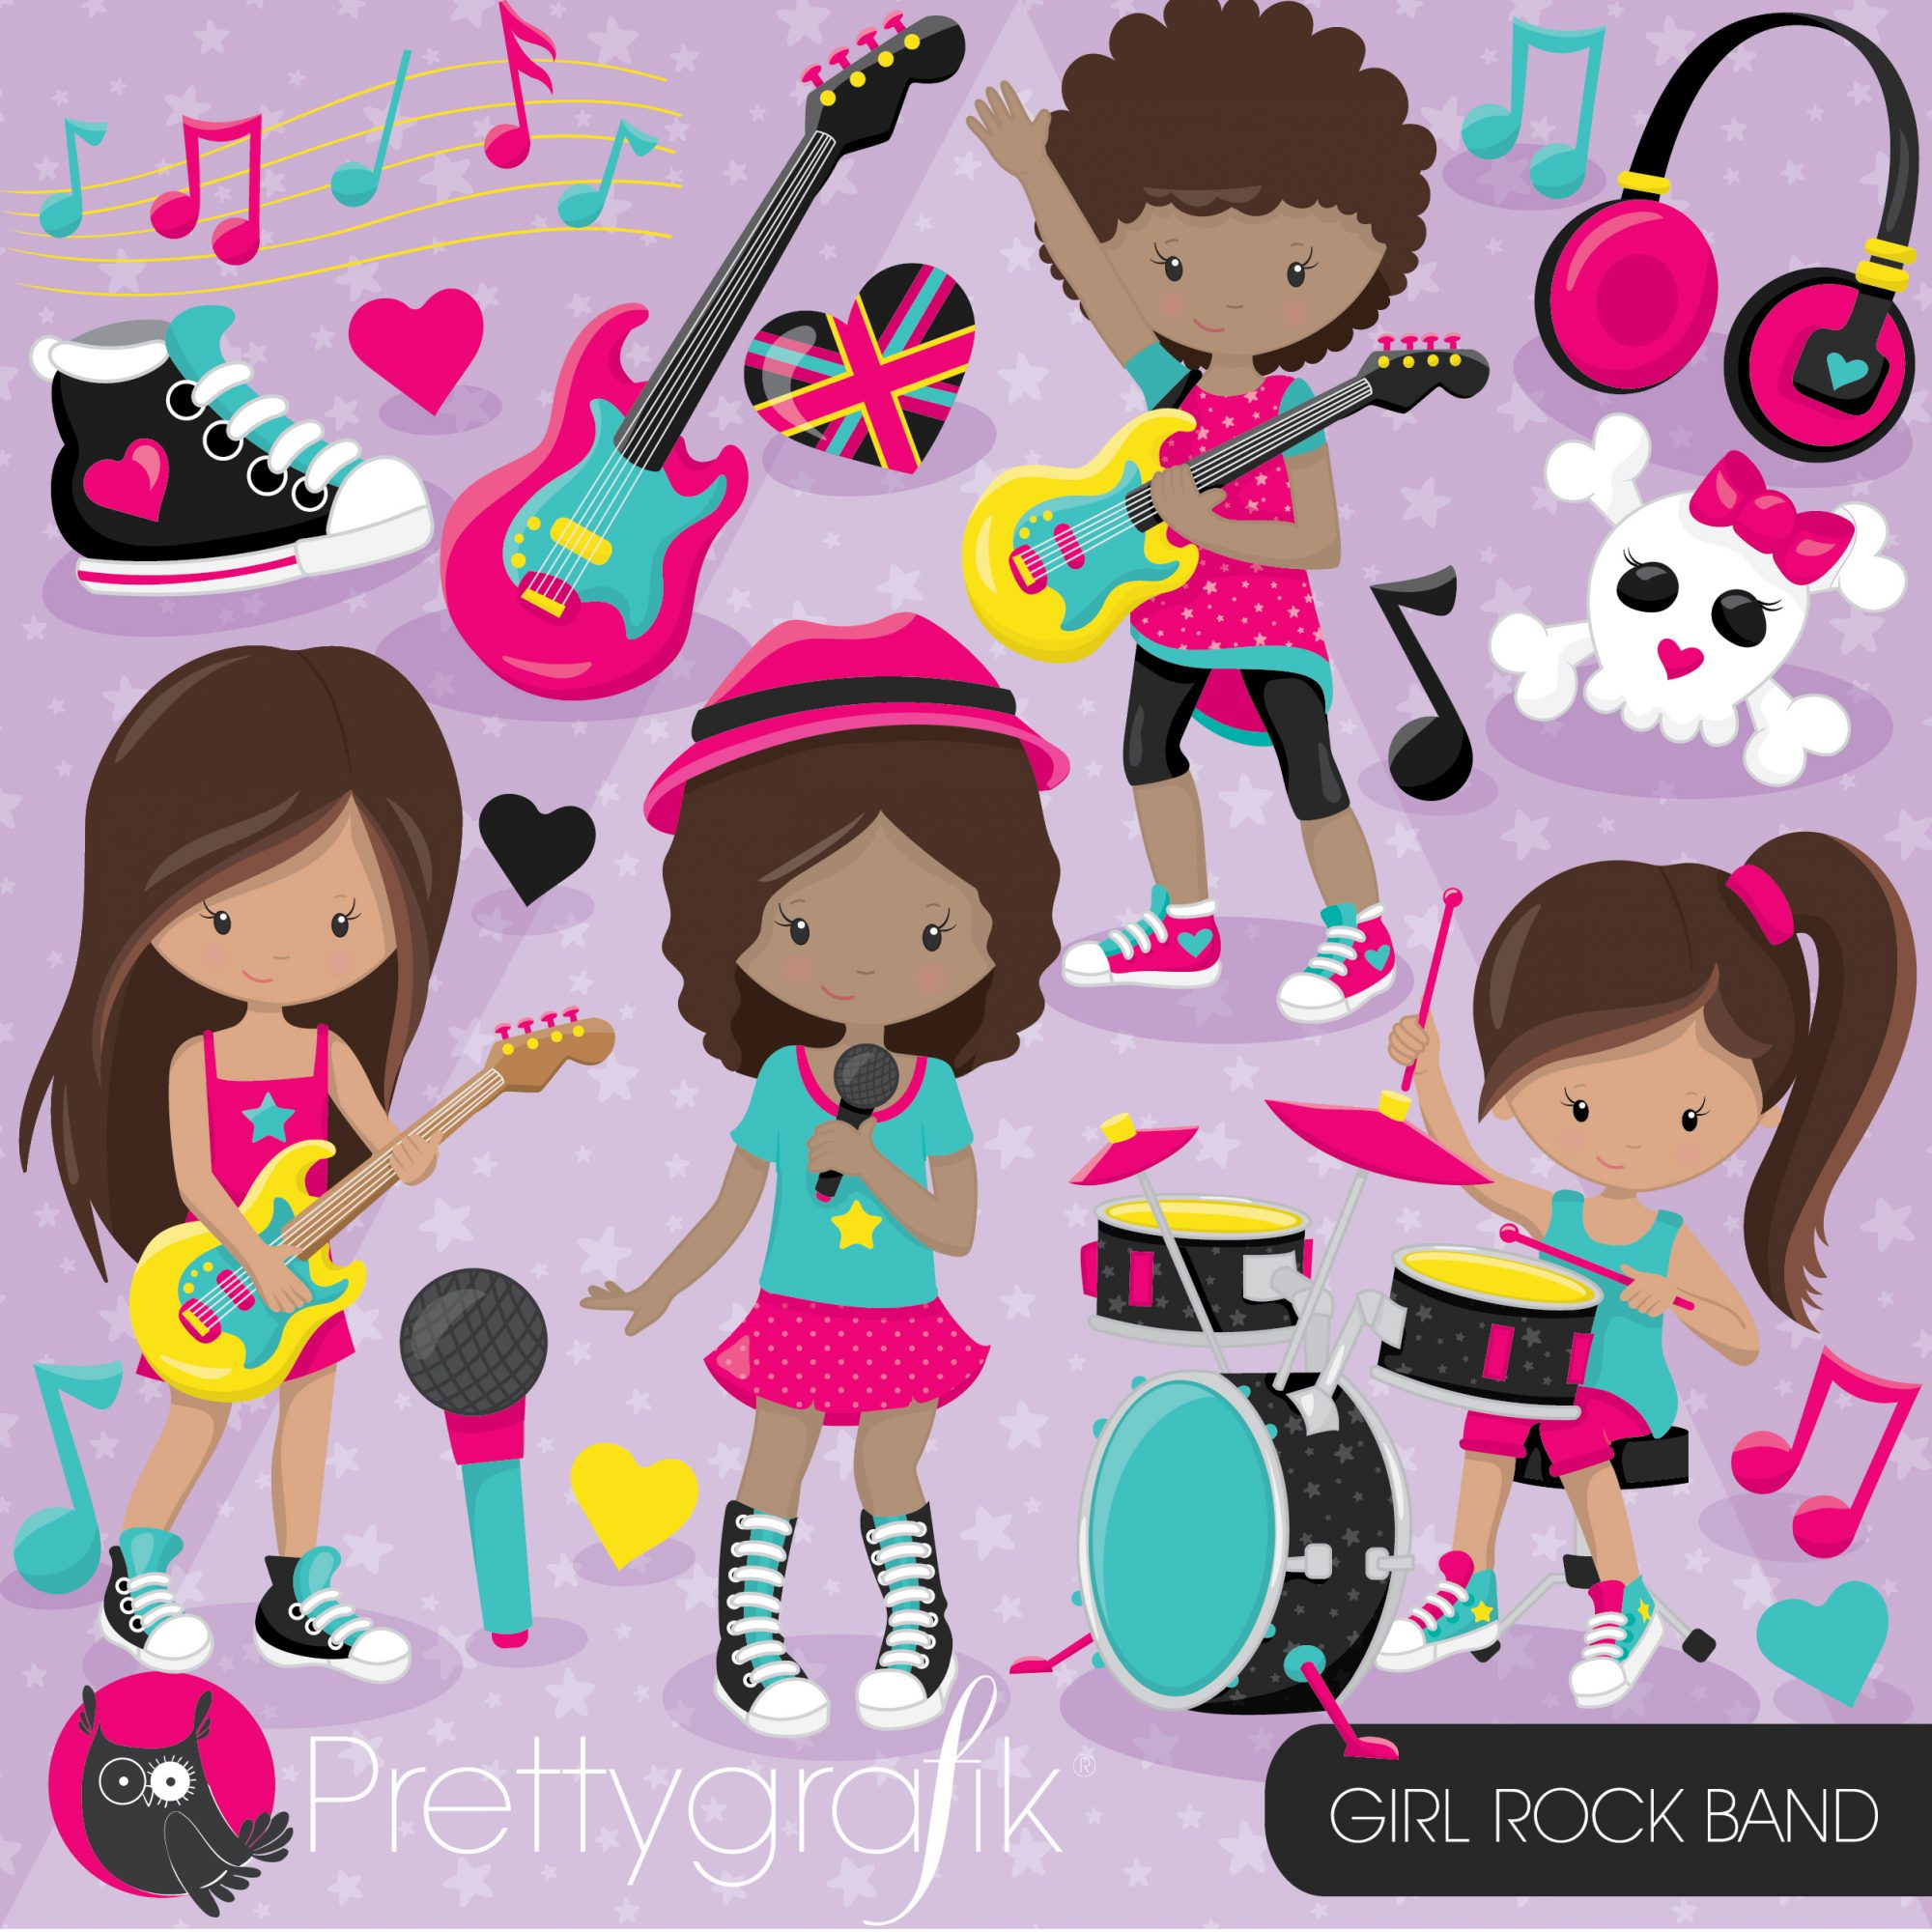 Band clipart kids rock. Girl prettygrafik store